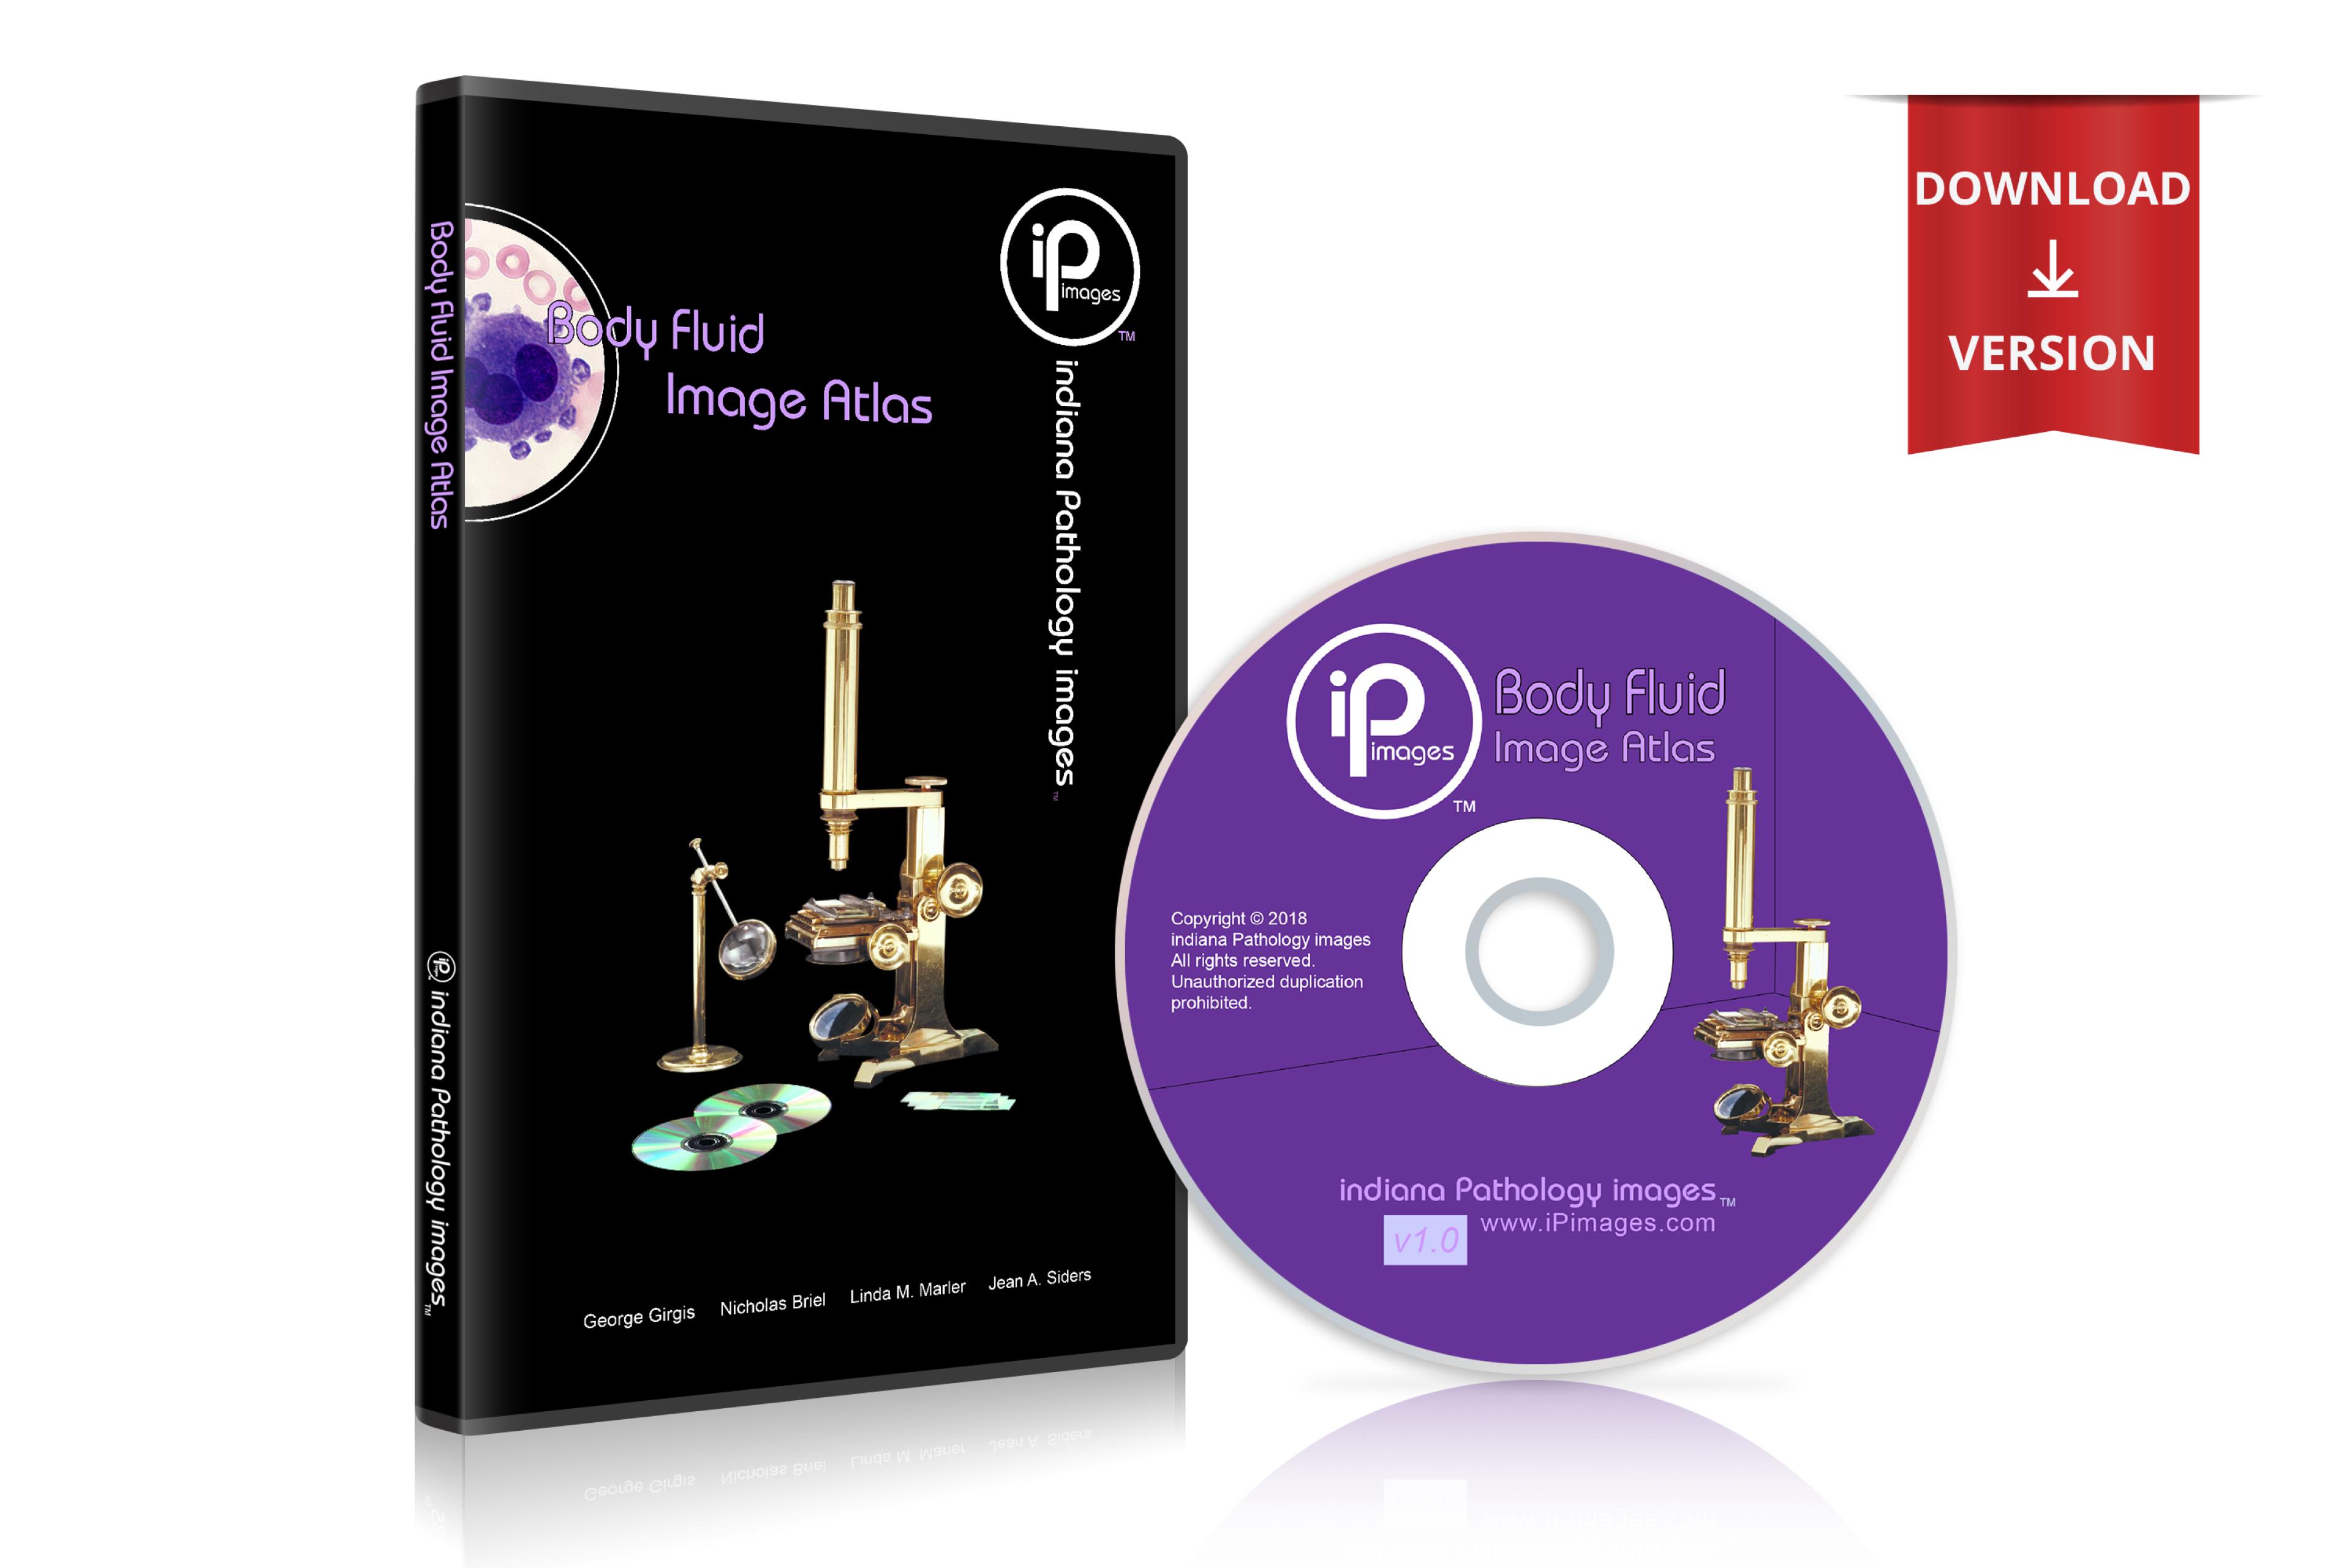 Body Fluid Image Atlas Single User Download